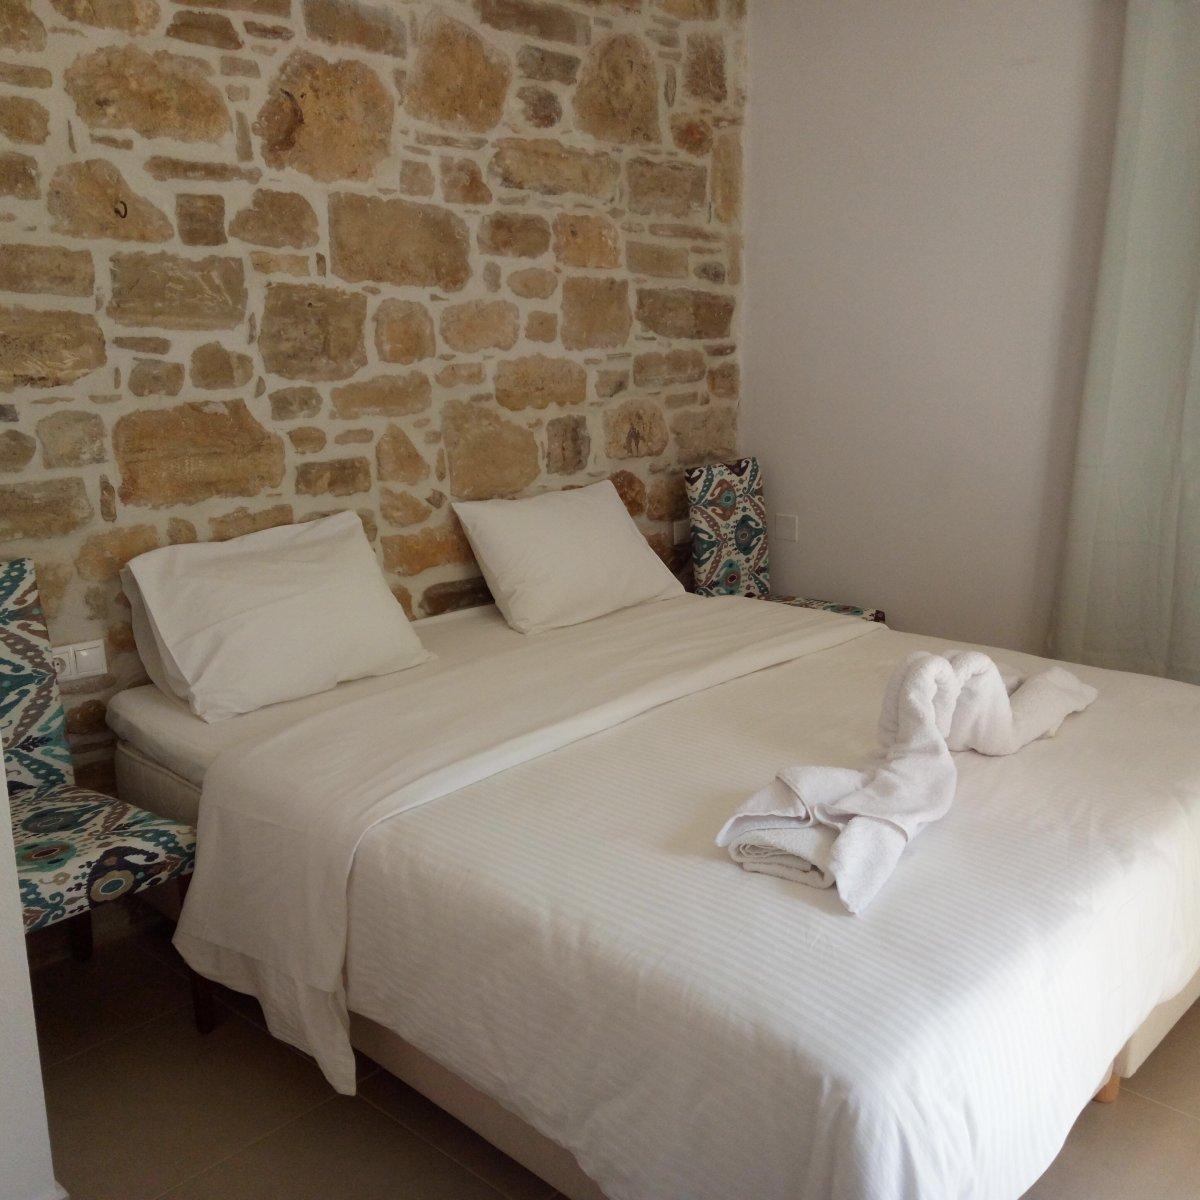 Bodikos Hotel - ANTONIOS 2